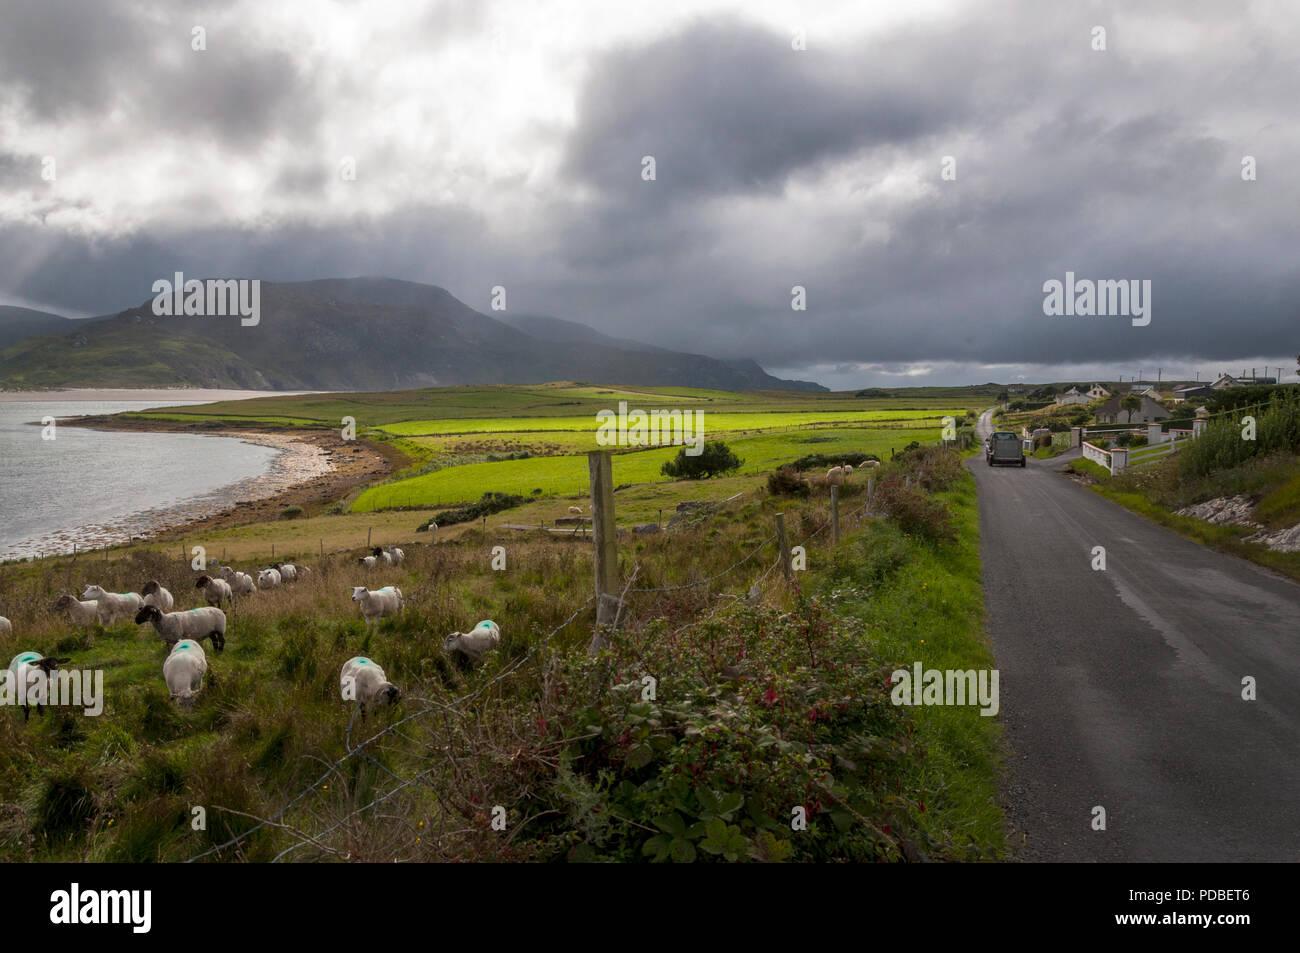 Sheep graze in a field in County Donegal Atlantic Ocean coast, Ireland - Stock Image